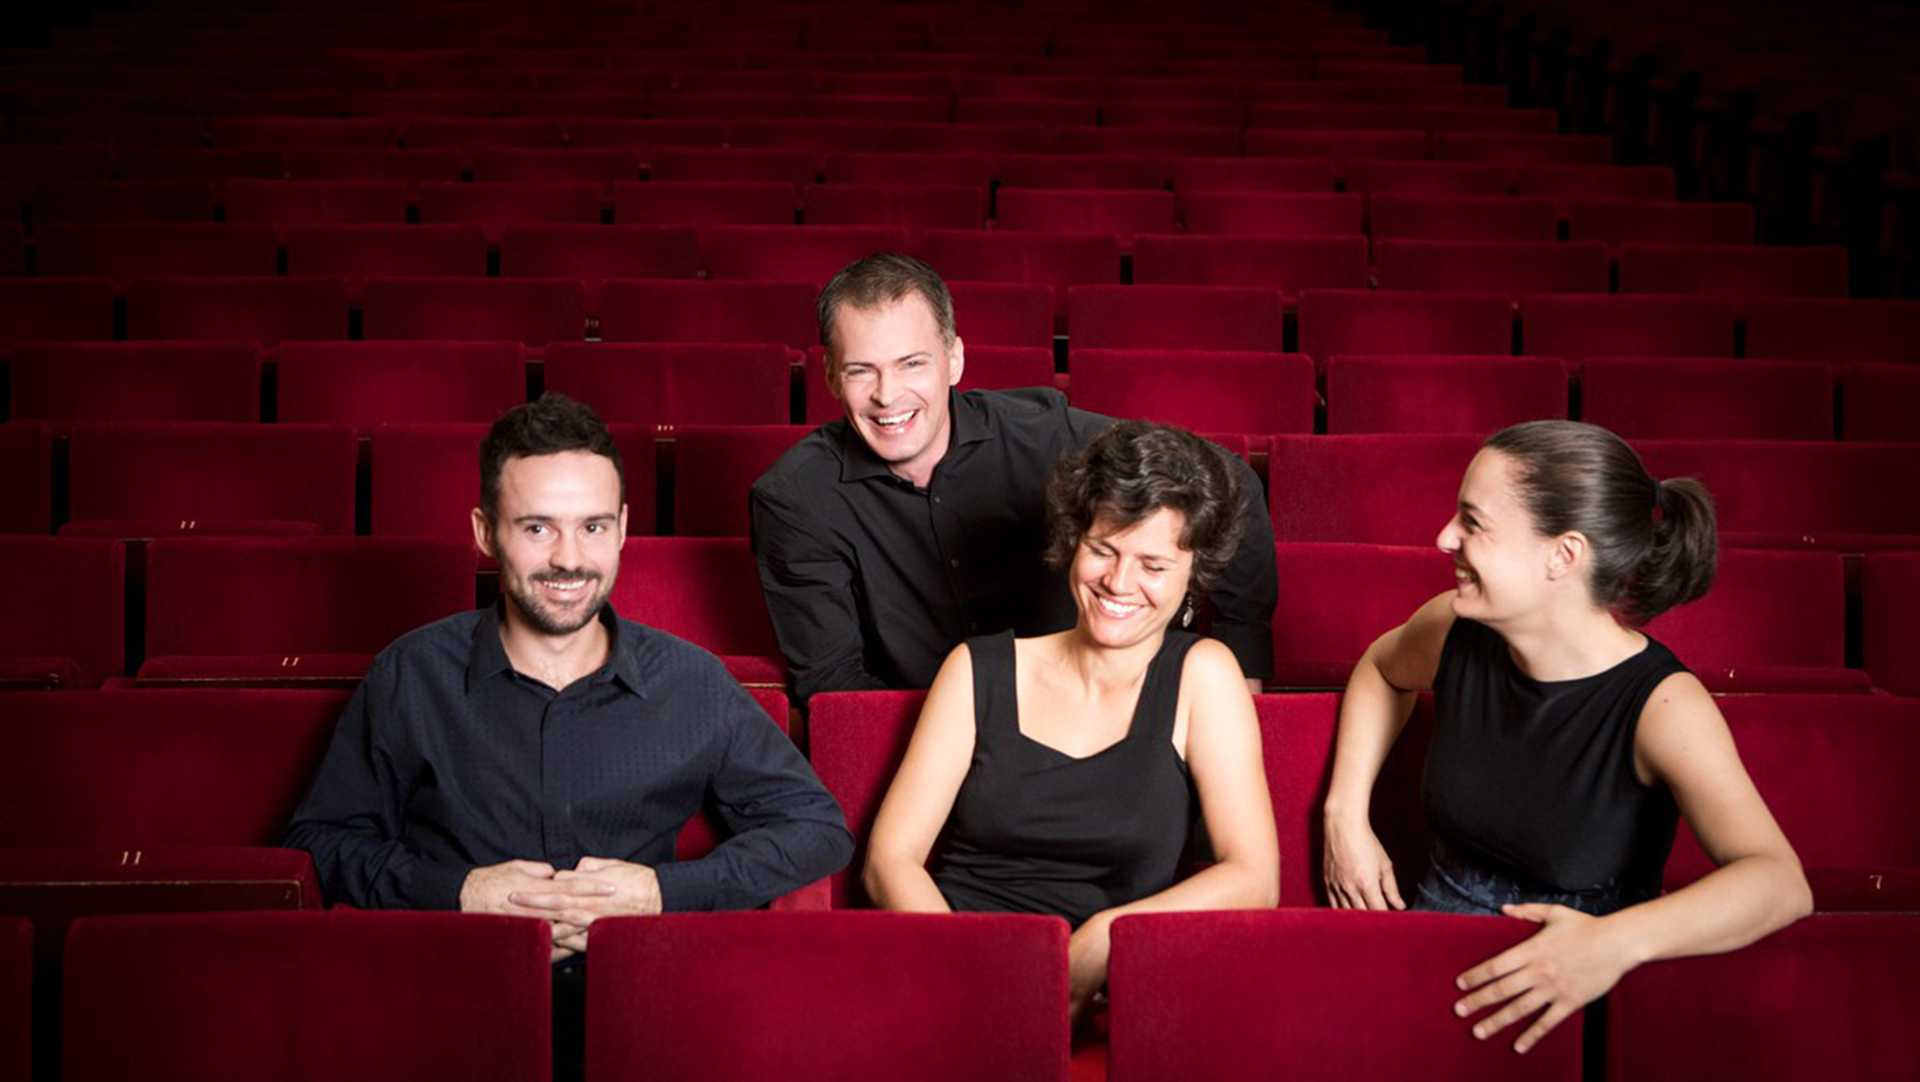 The Elias String Quartet visits Hancher, exhibiting international collaboration